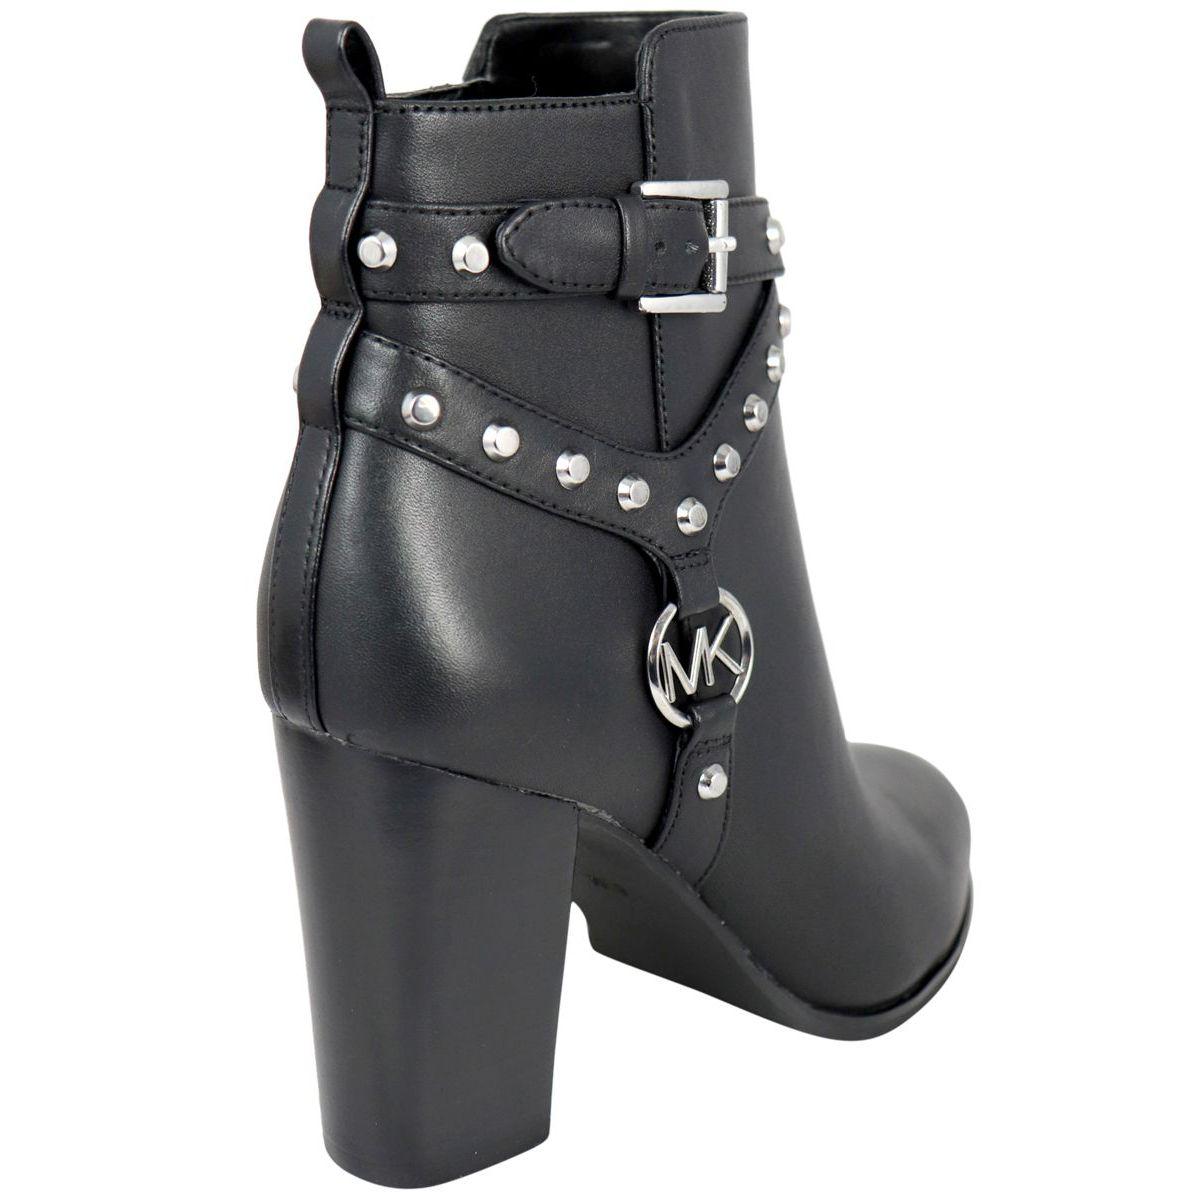 PRESTON handbag in leather with high heel Black Michael Kors